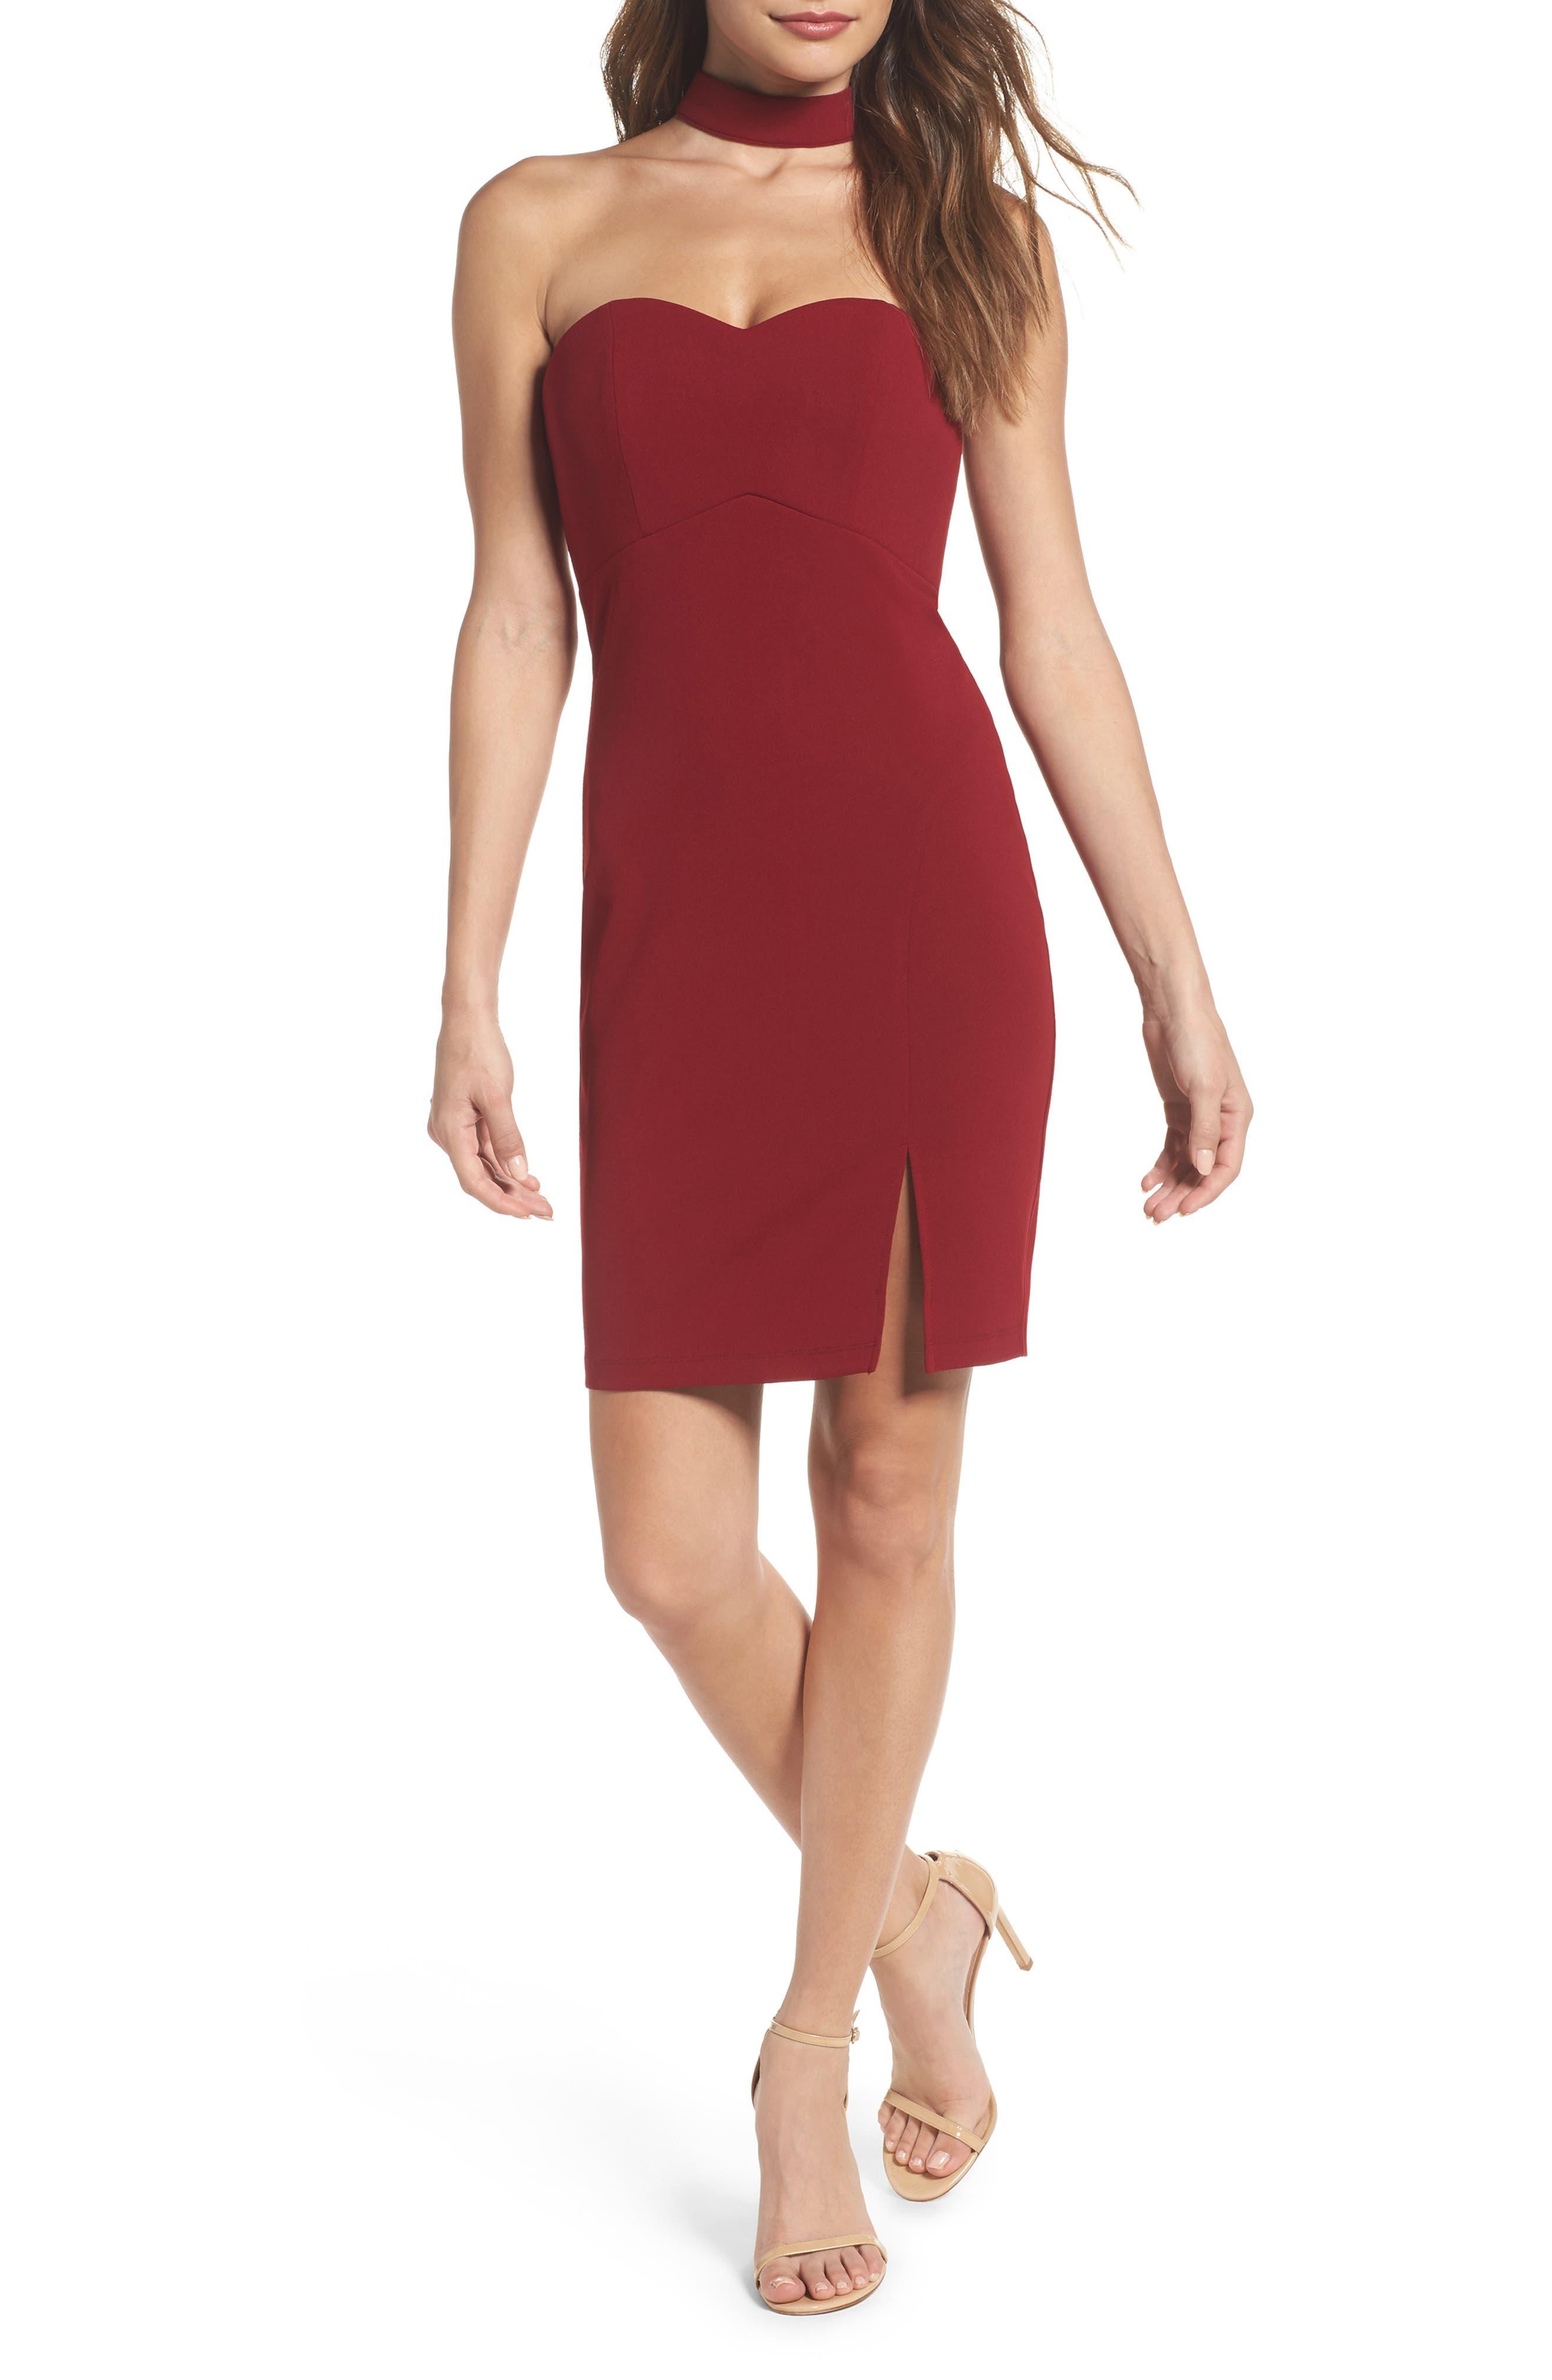 Sequin Hearts Choker Neck Body-Con Dress